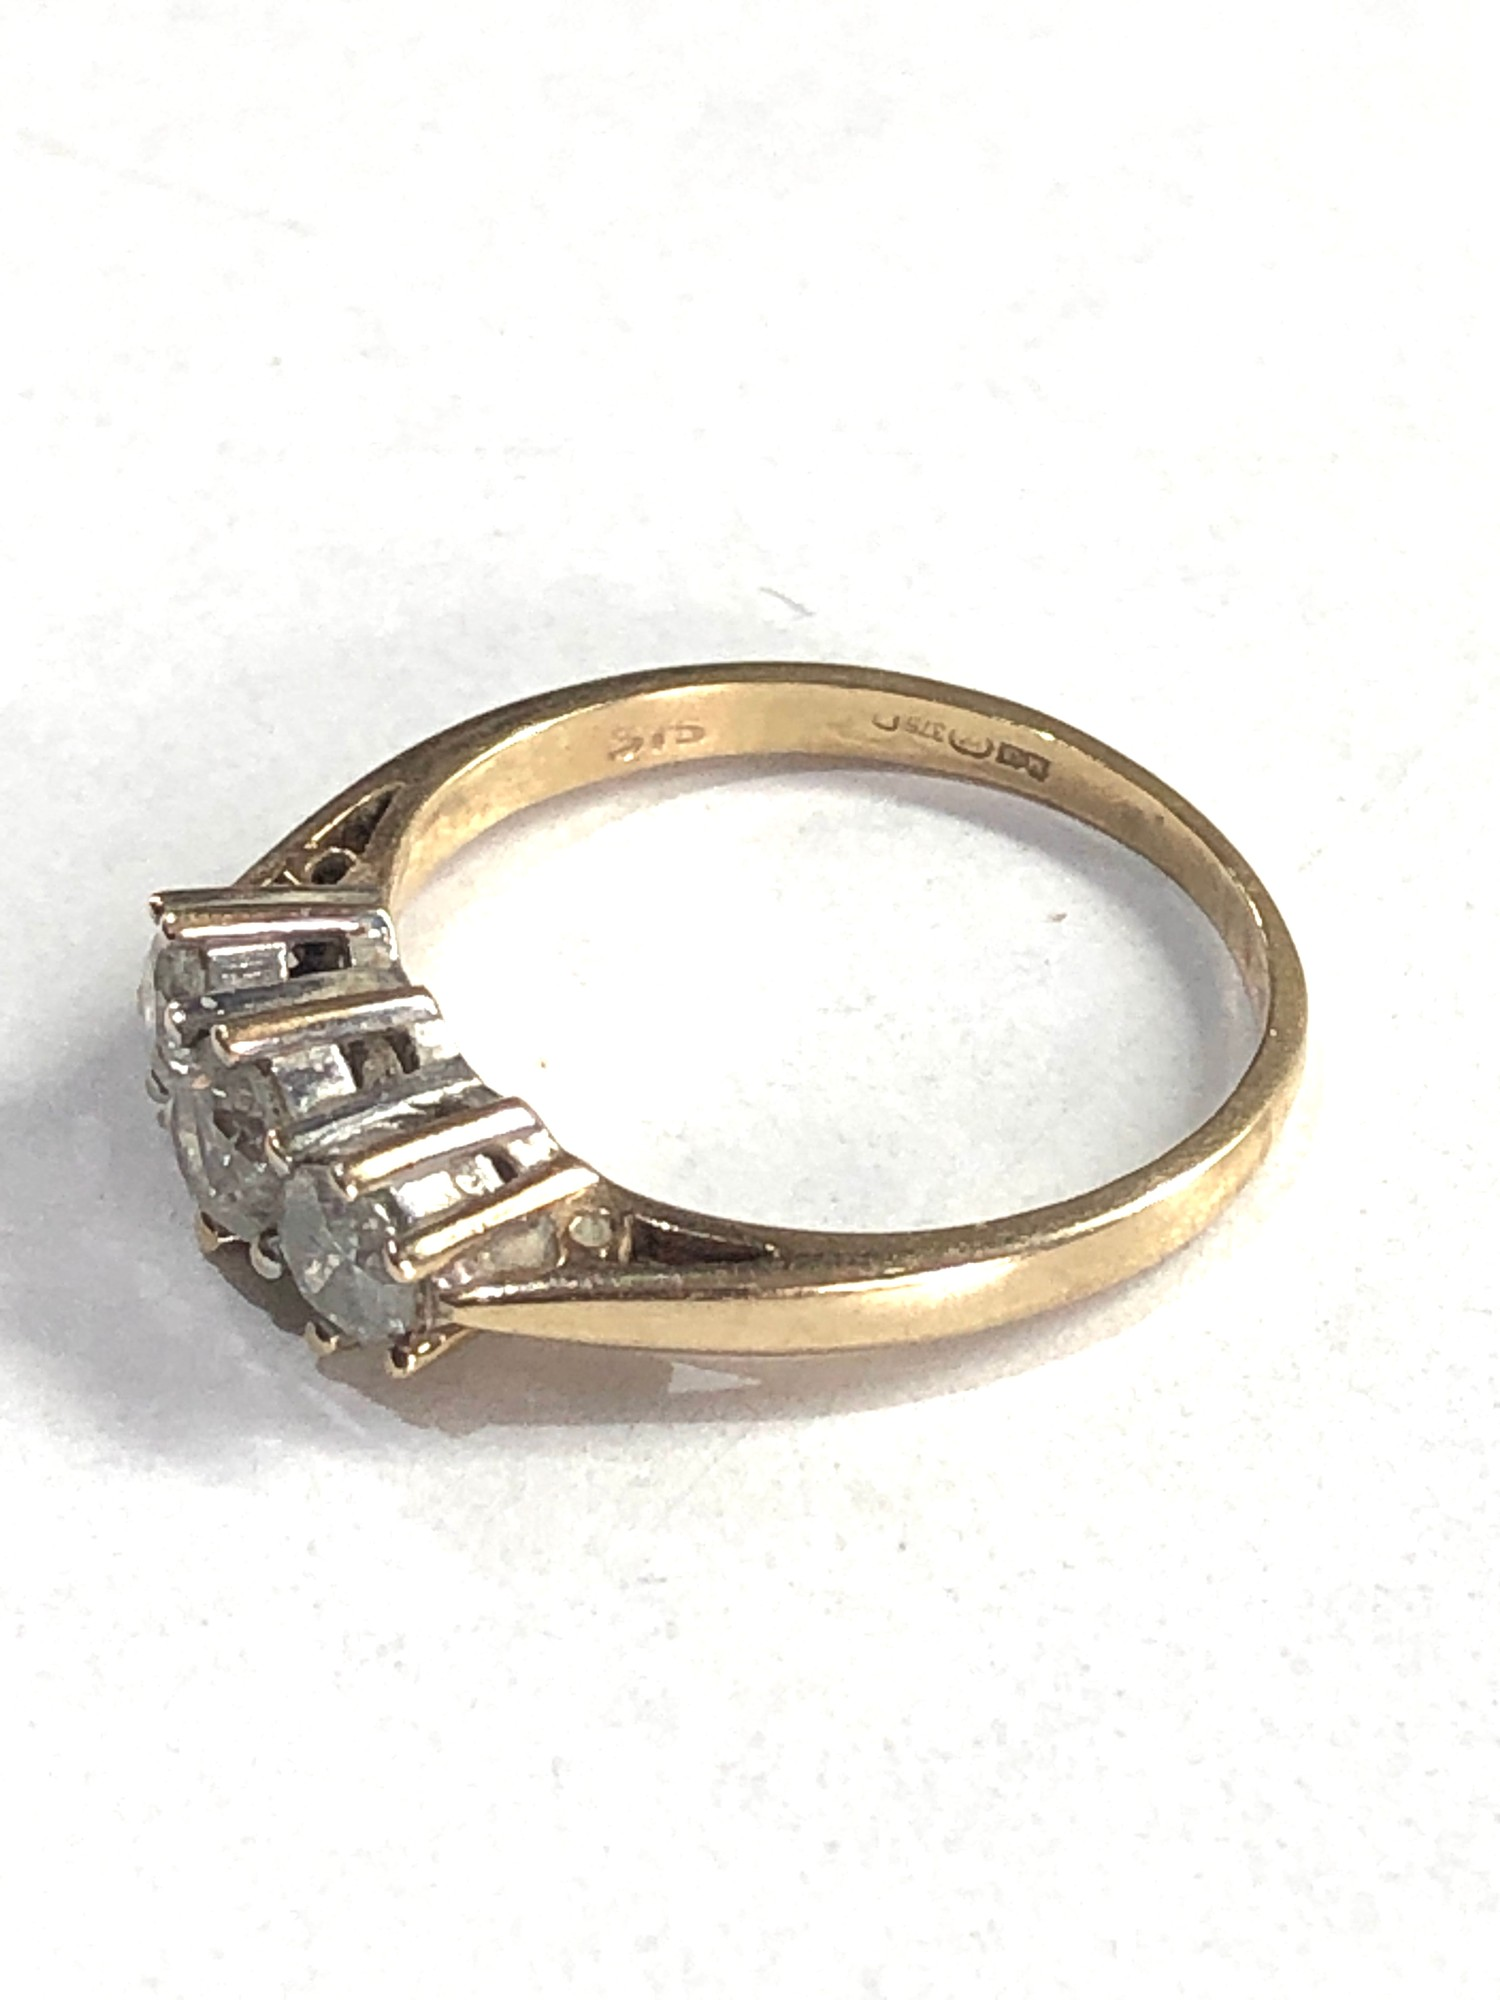 9ct gold 0.50ct diamond trilogy ring 1.8g - Image 2 of 3